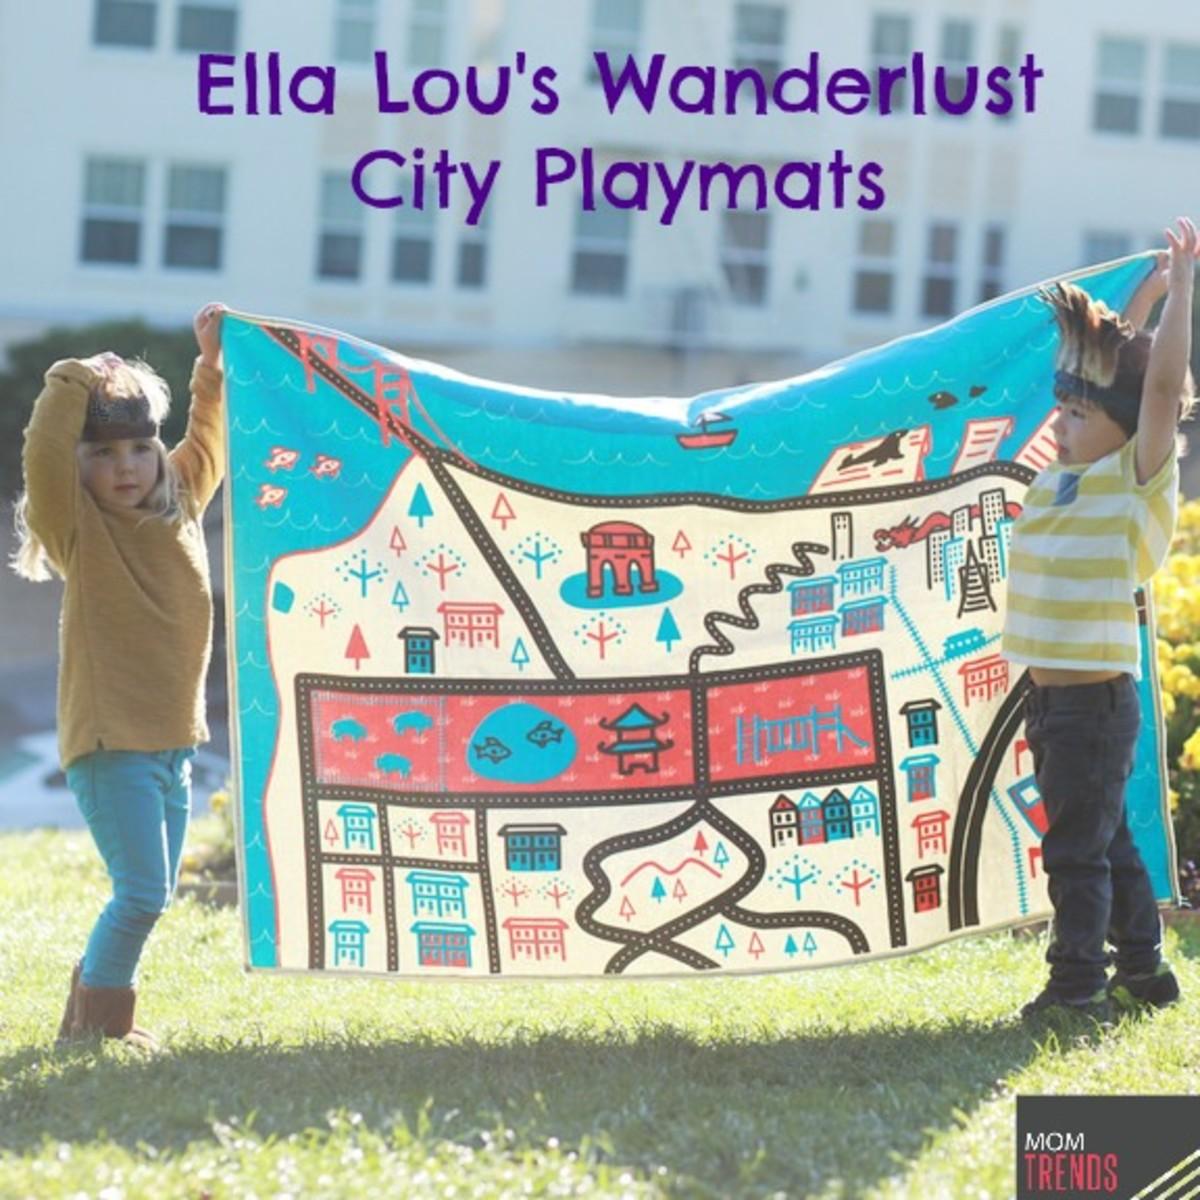 Ella Lou's Wanderlust City Playmats